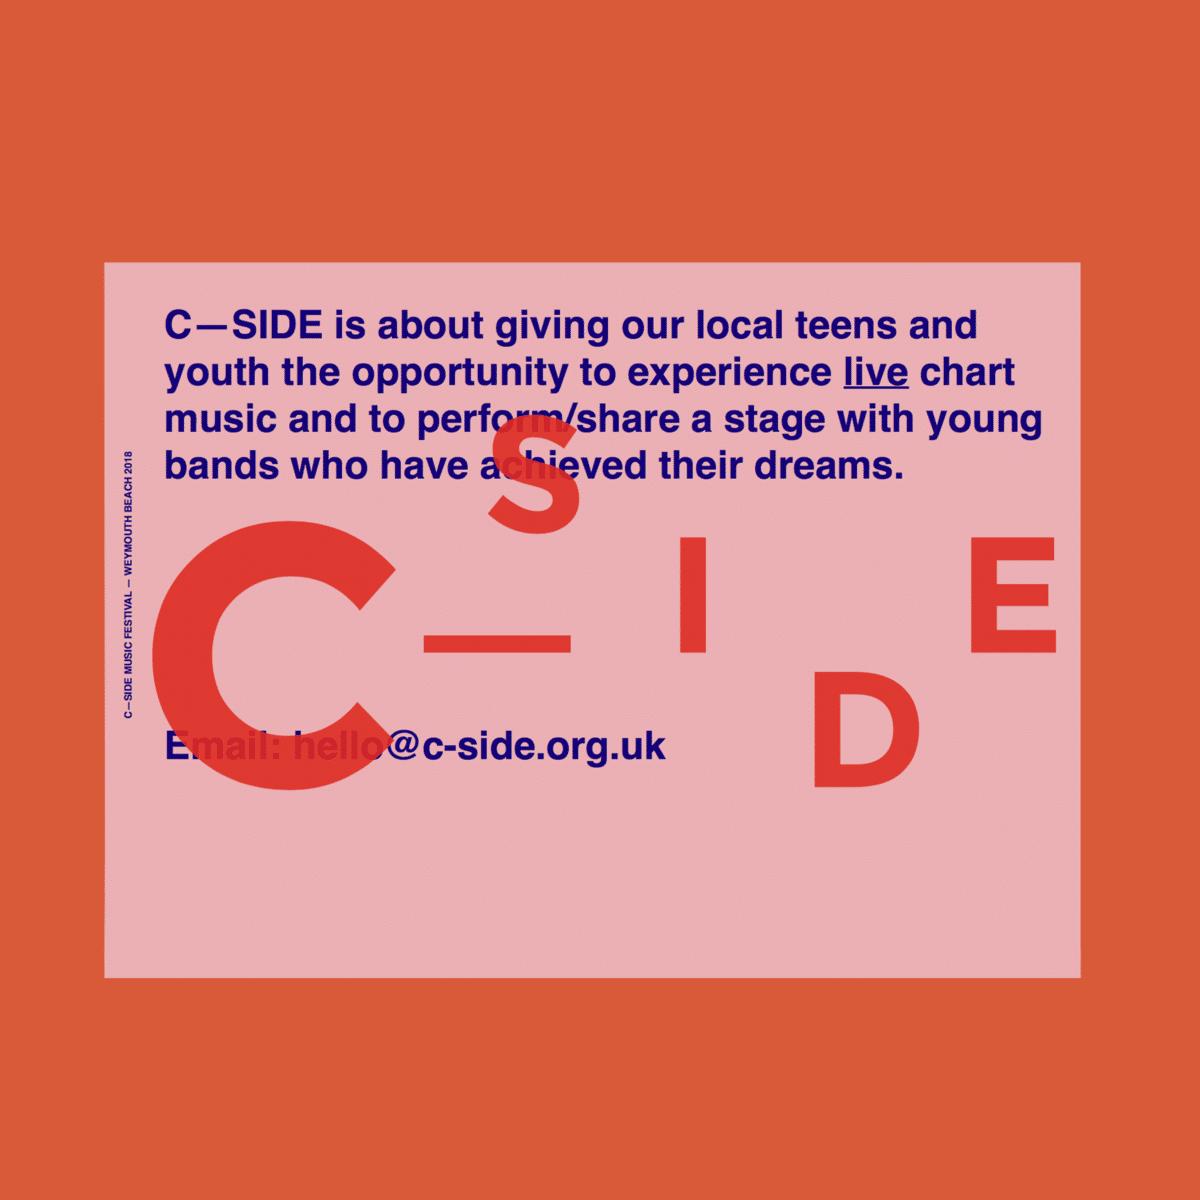 New Work — Coming Soon.Brand Identity + Web.#Brand #Branding #Design #Graphicdesign #British #logo #logos #brands #NewRelease #contemporary #dorset #london #graphicdesigner #graphicdesign #designagency #brandingagency #web #webdesign #digital